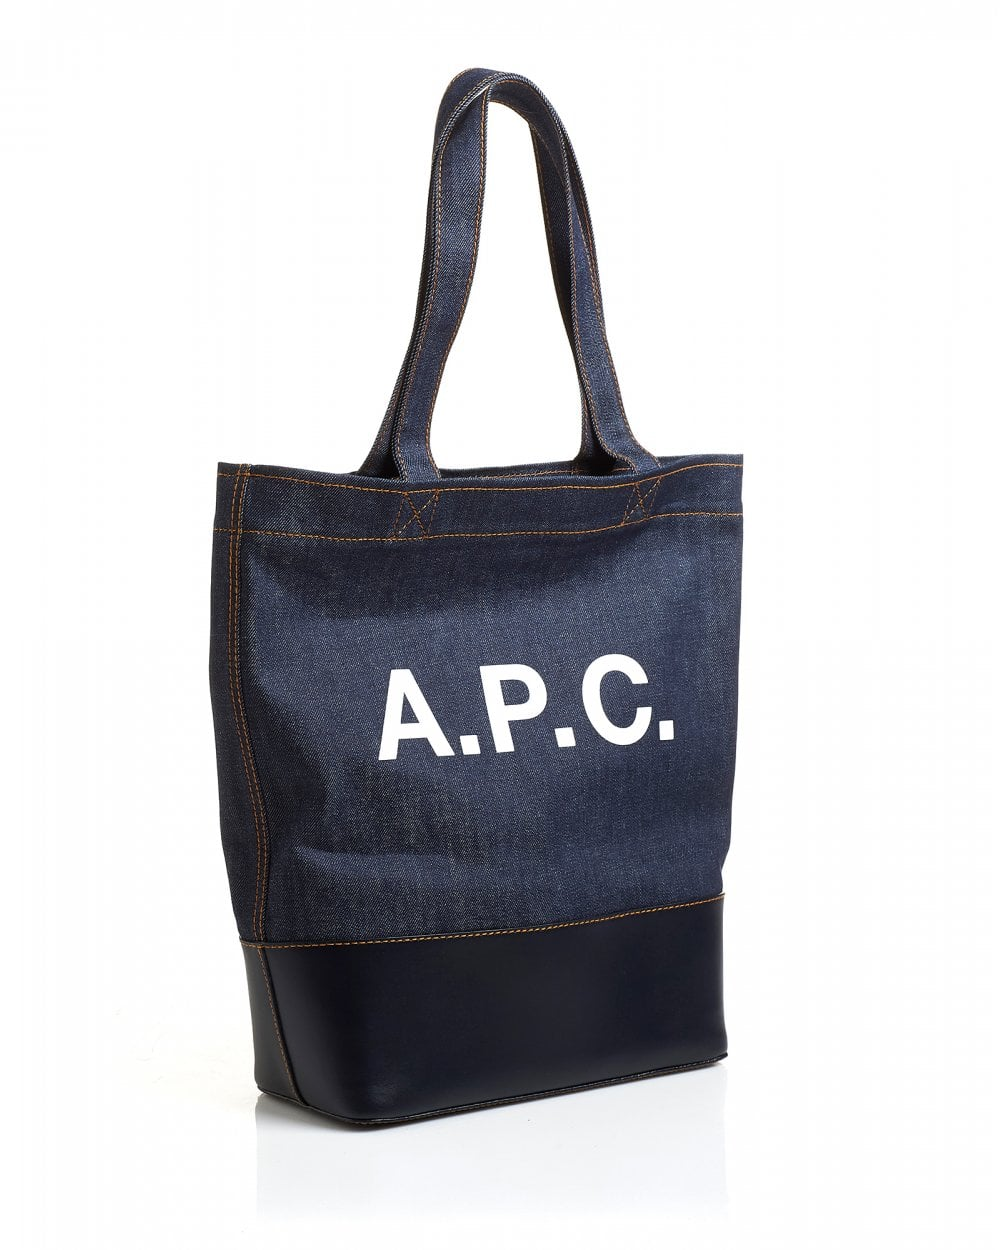 44cc113fb09b A.P.C. Mens Cabas Axel Denim Leather Tote Bag